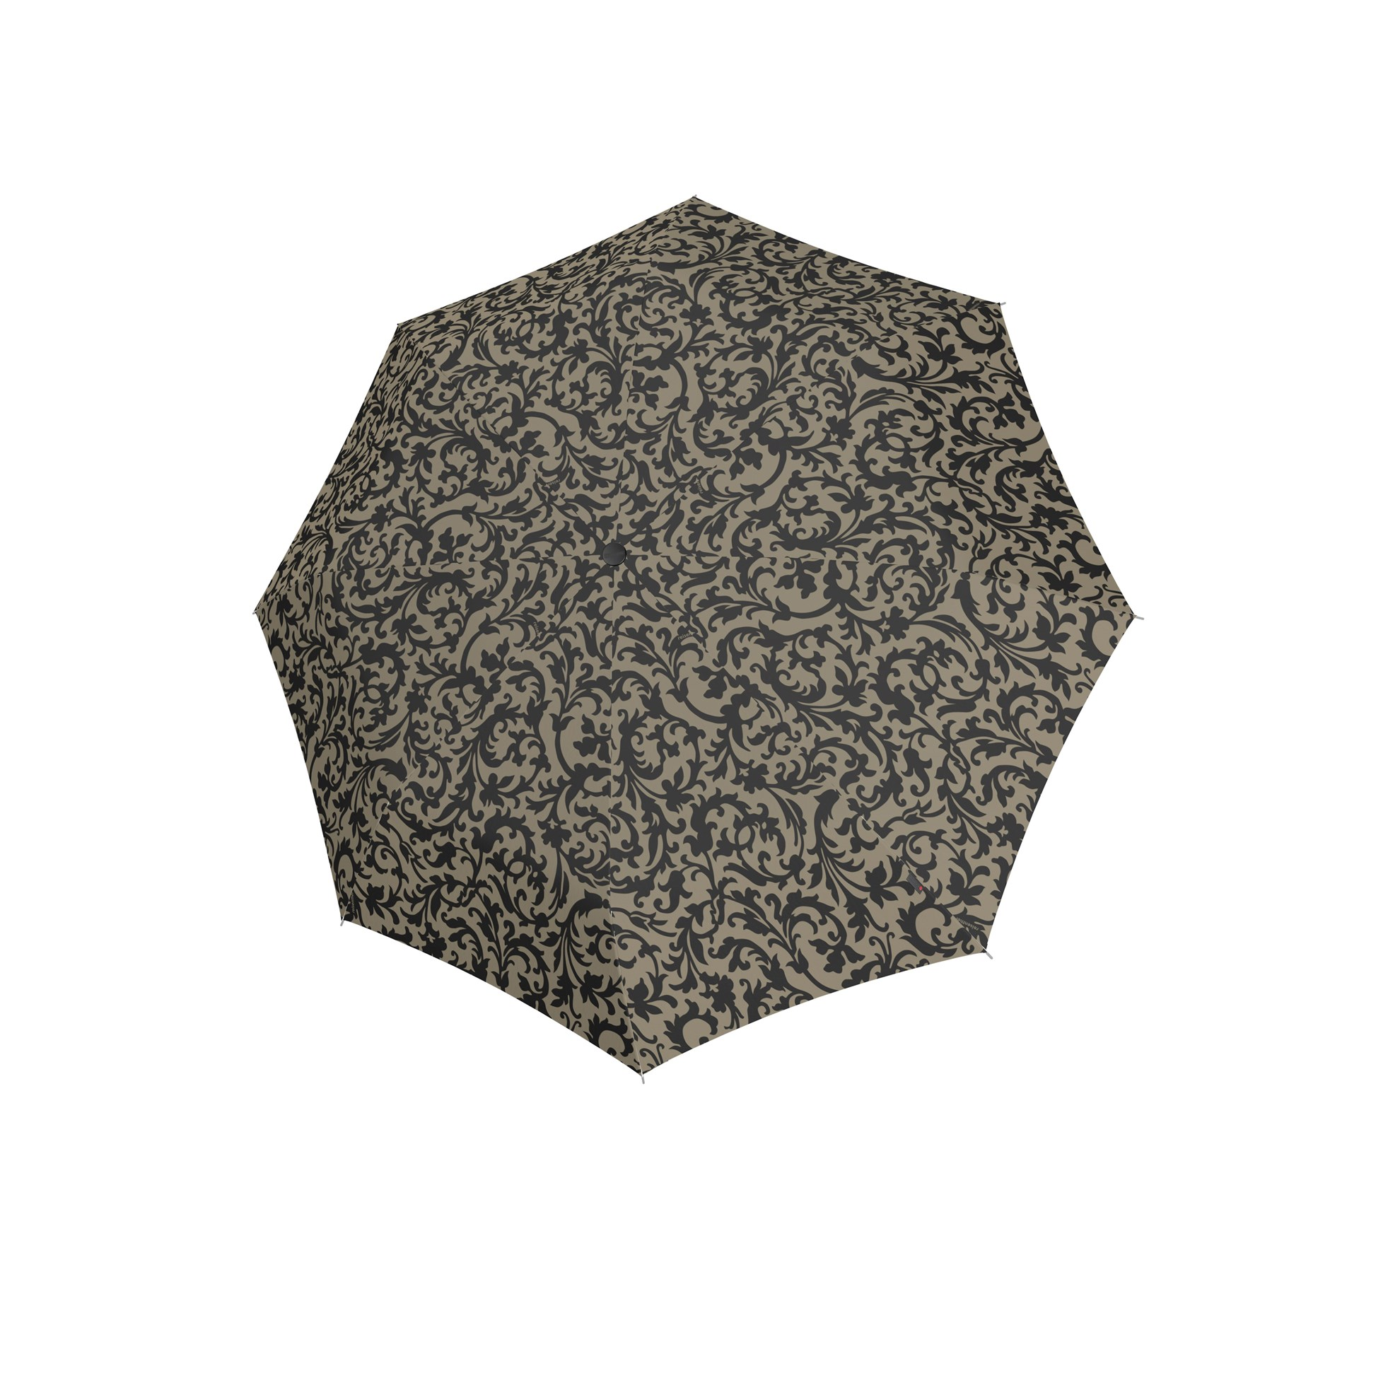 Deštník Umbrella Pocket Classic baroque taupe_1